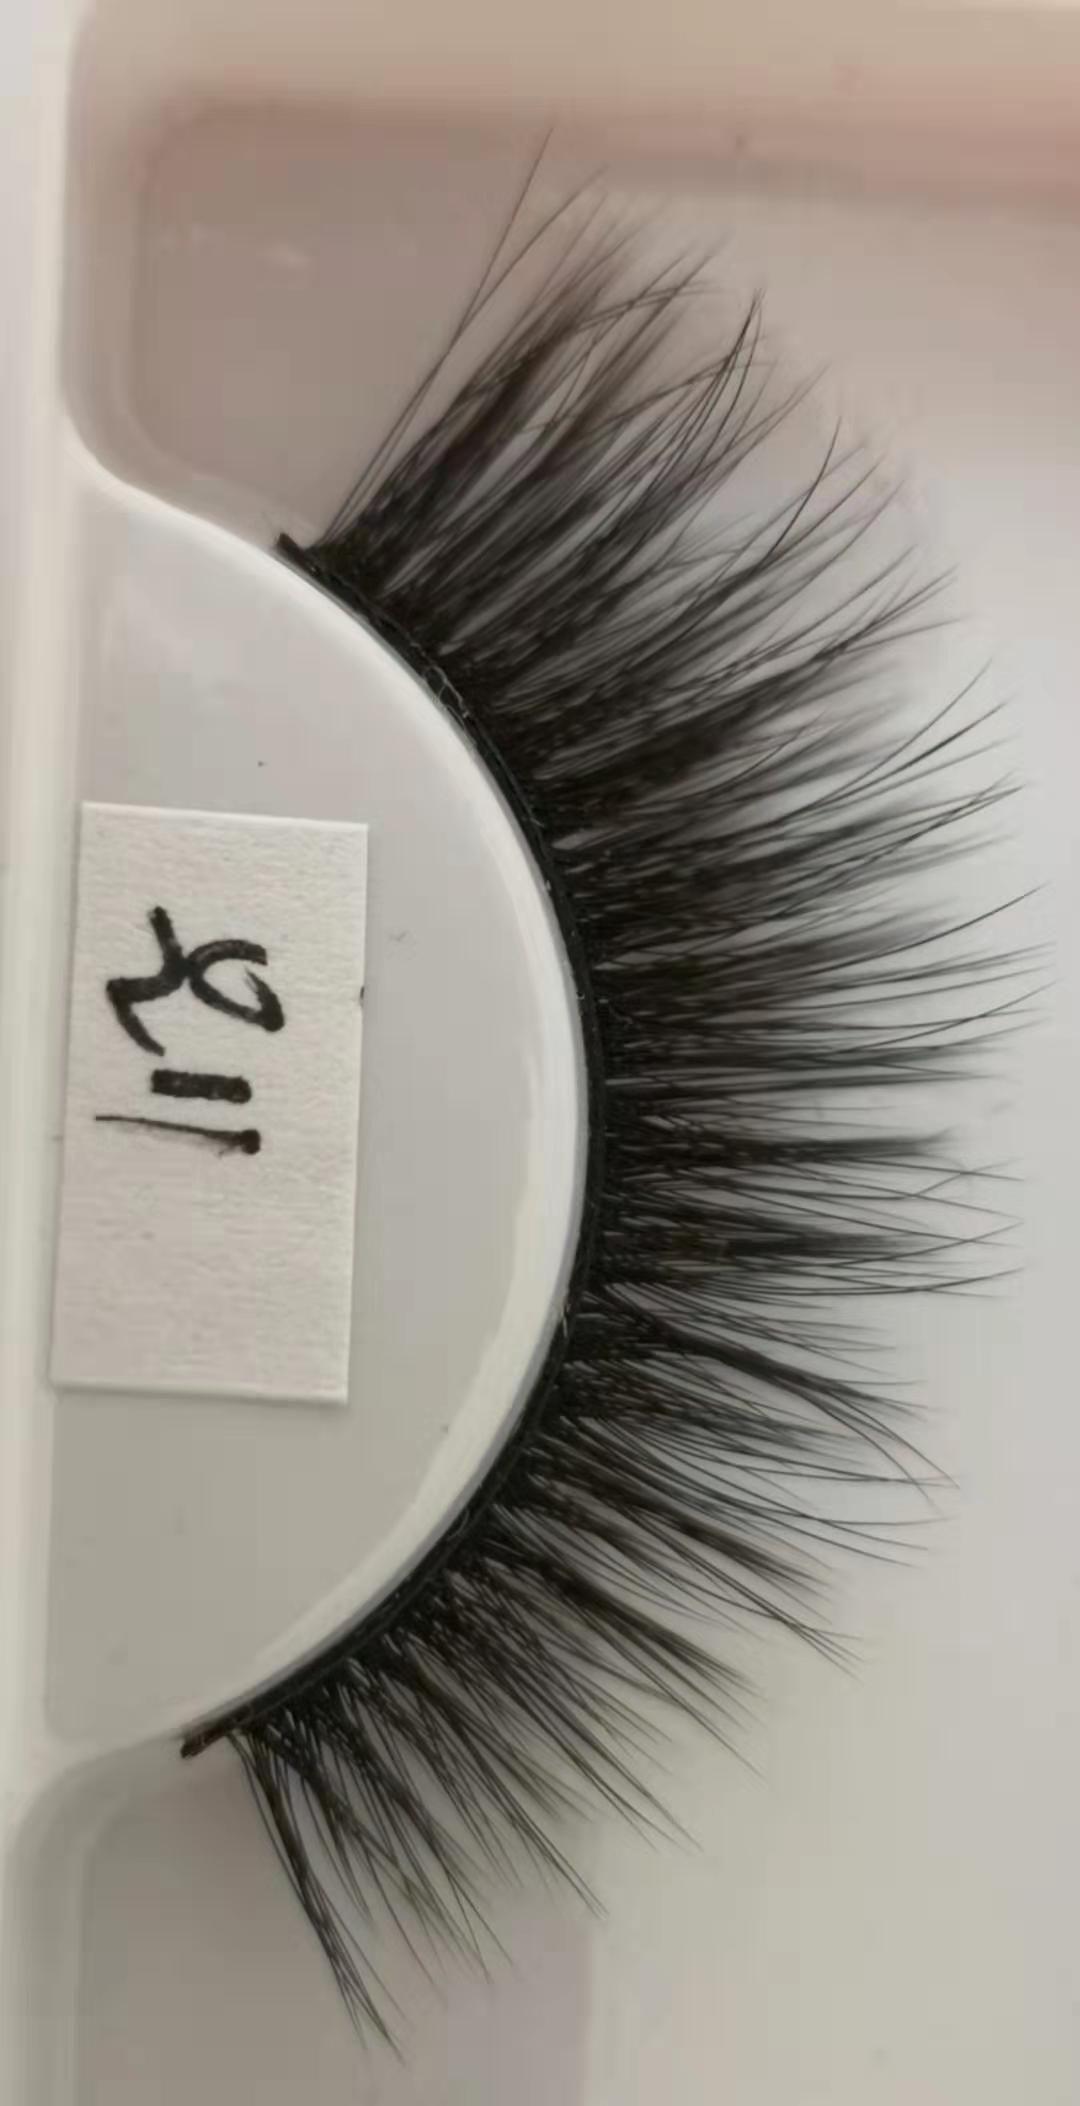 Q11 False eyelashes 3D chemical fiber 0.07 soft natural realistic custom brand custom packaging handmade wholesaler